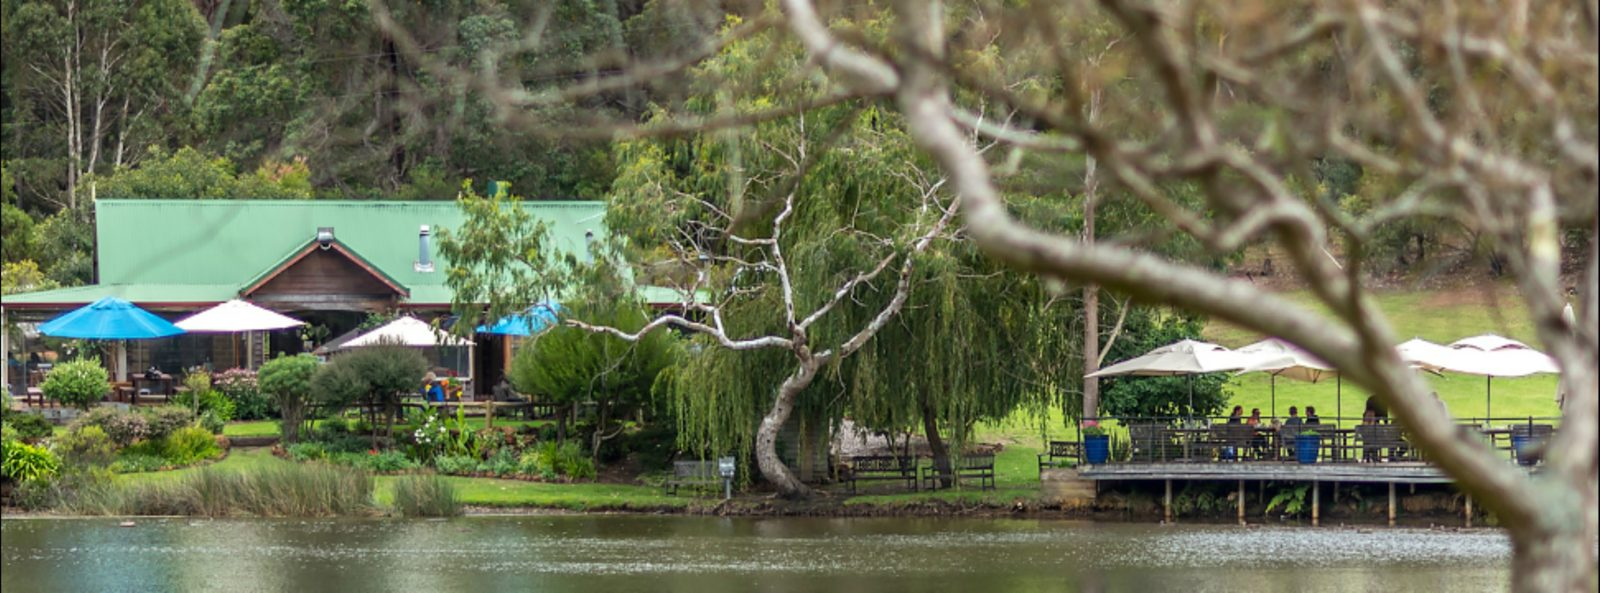 The Lakehouse, Denmark, Western Australia